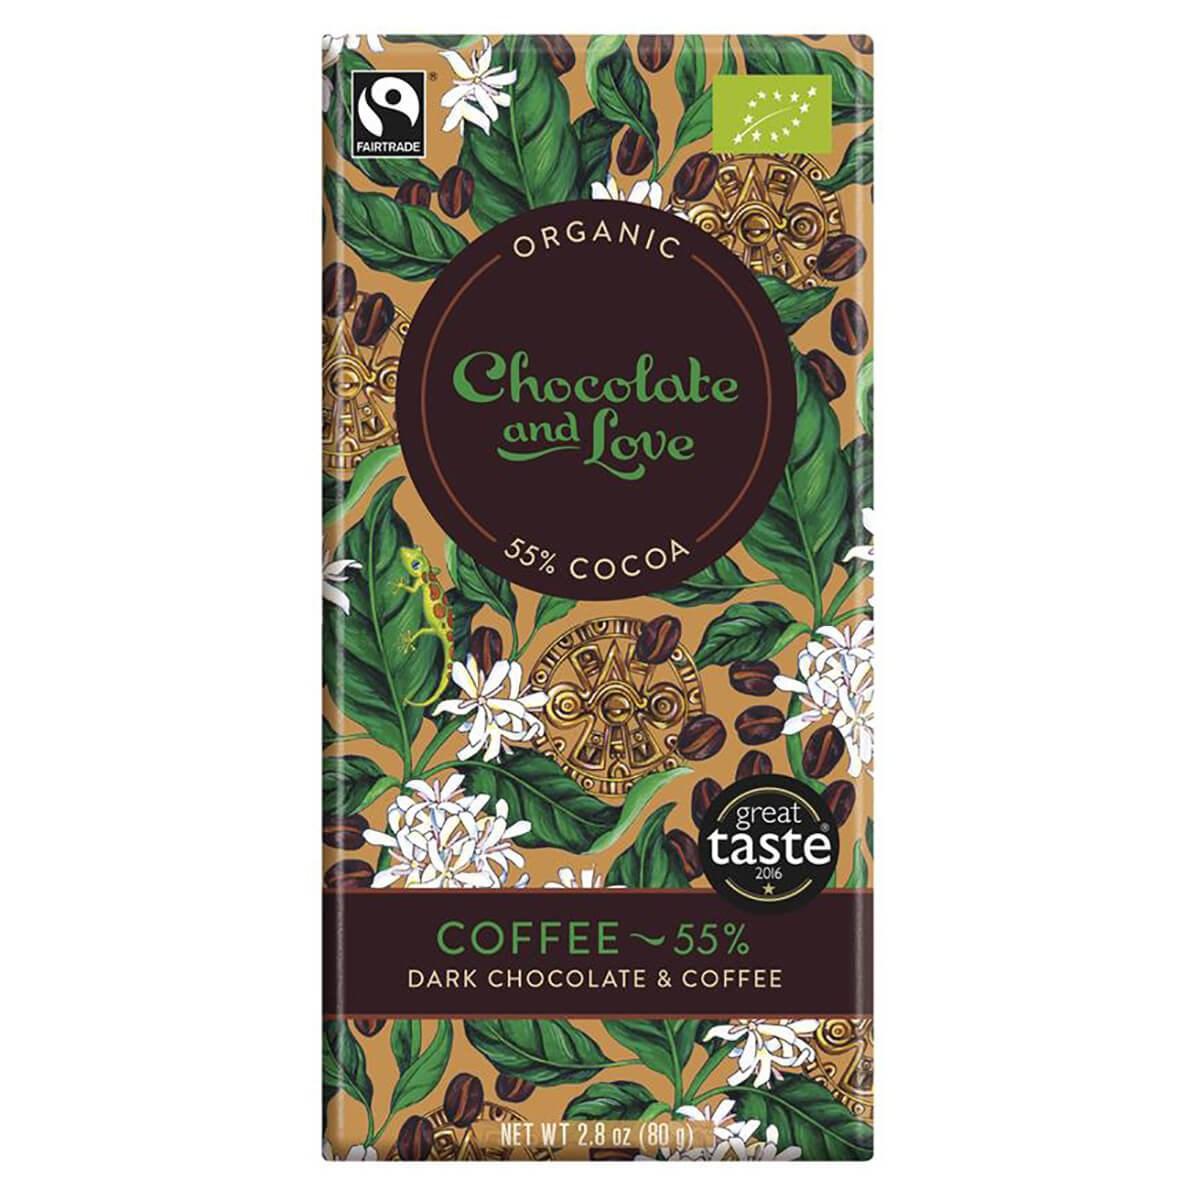 Chocolate and Love Organic & Fairtrade 55% Dark Chocolate with Coffee